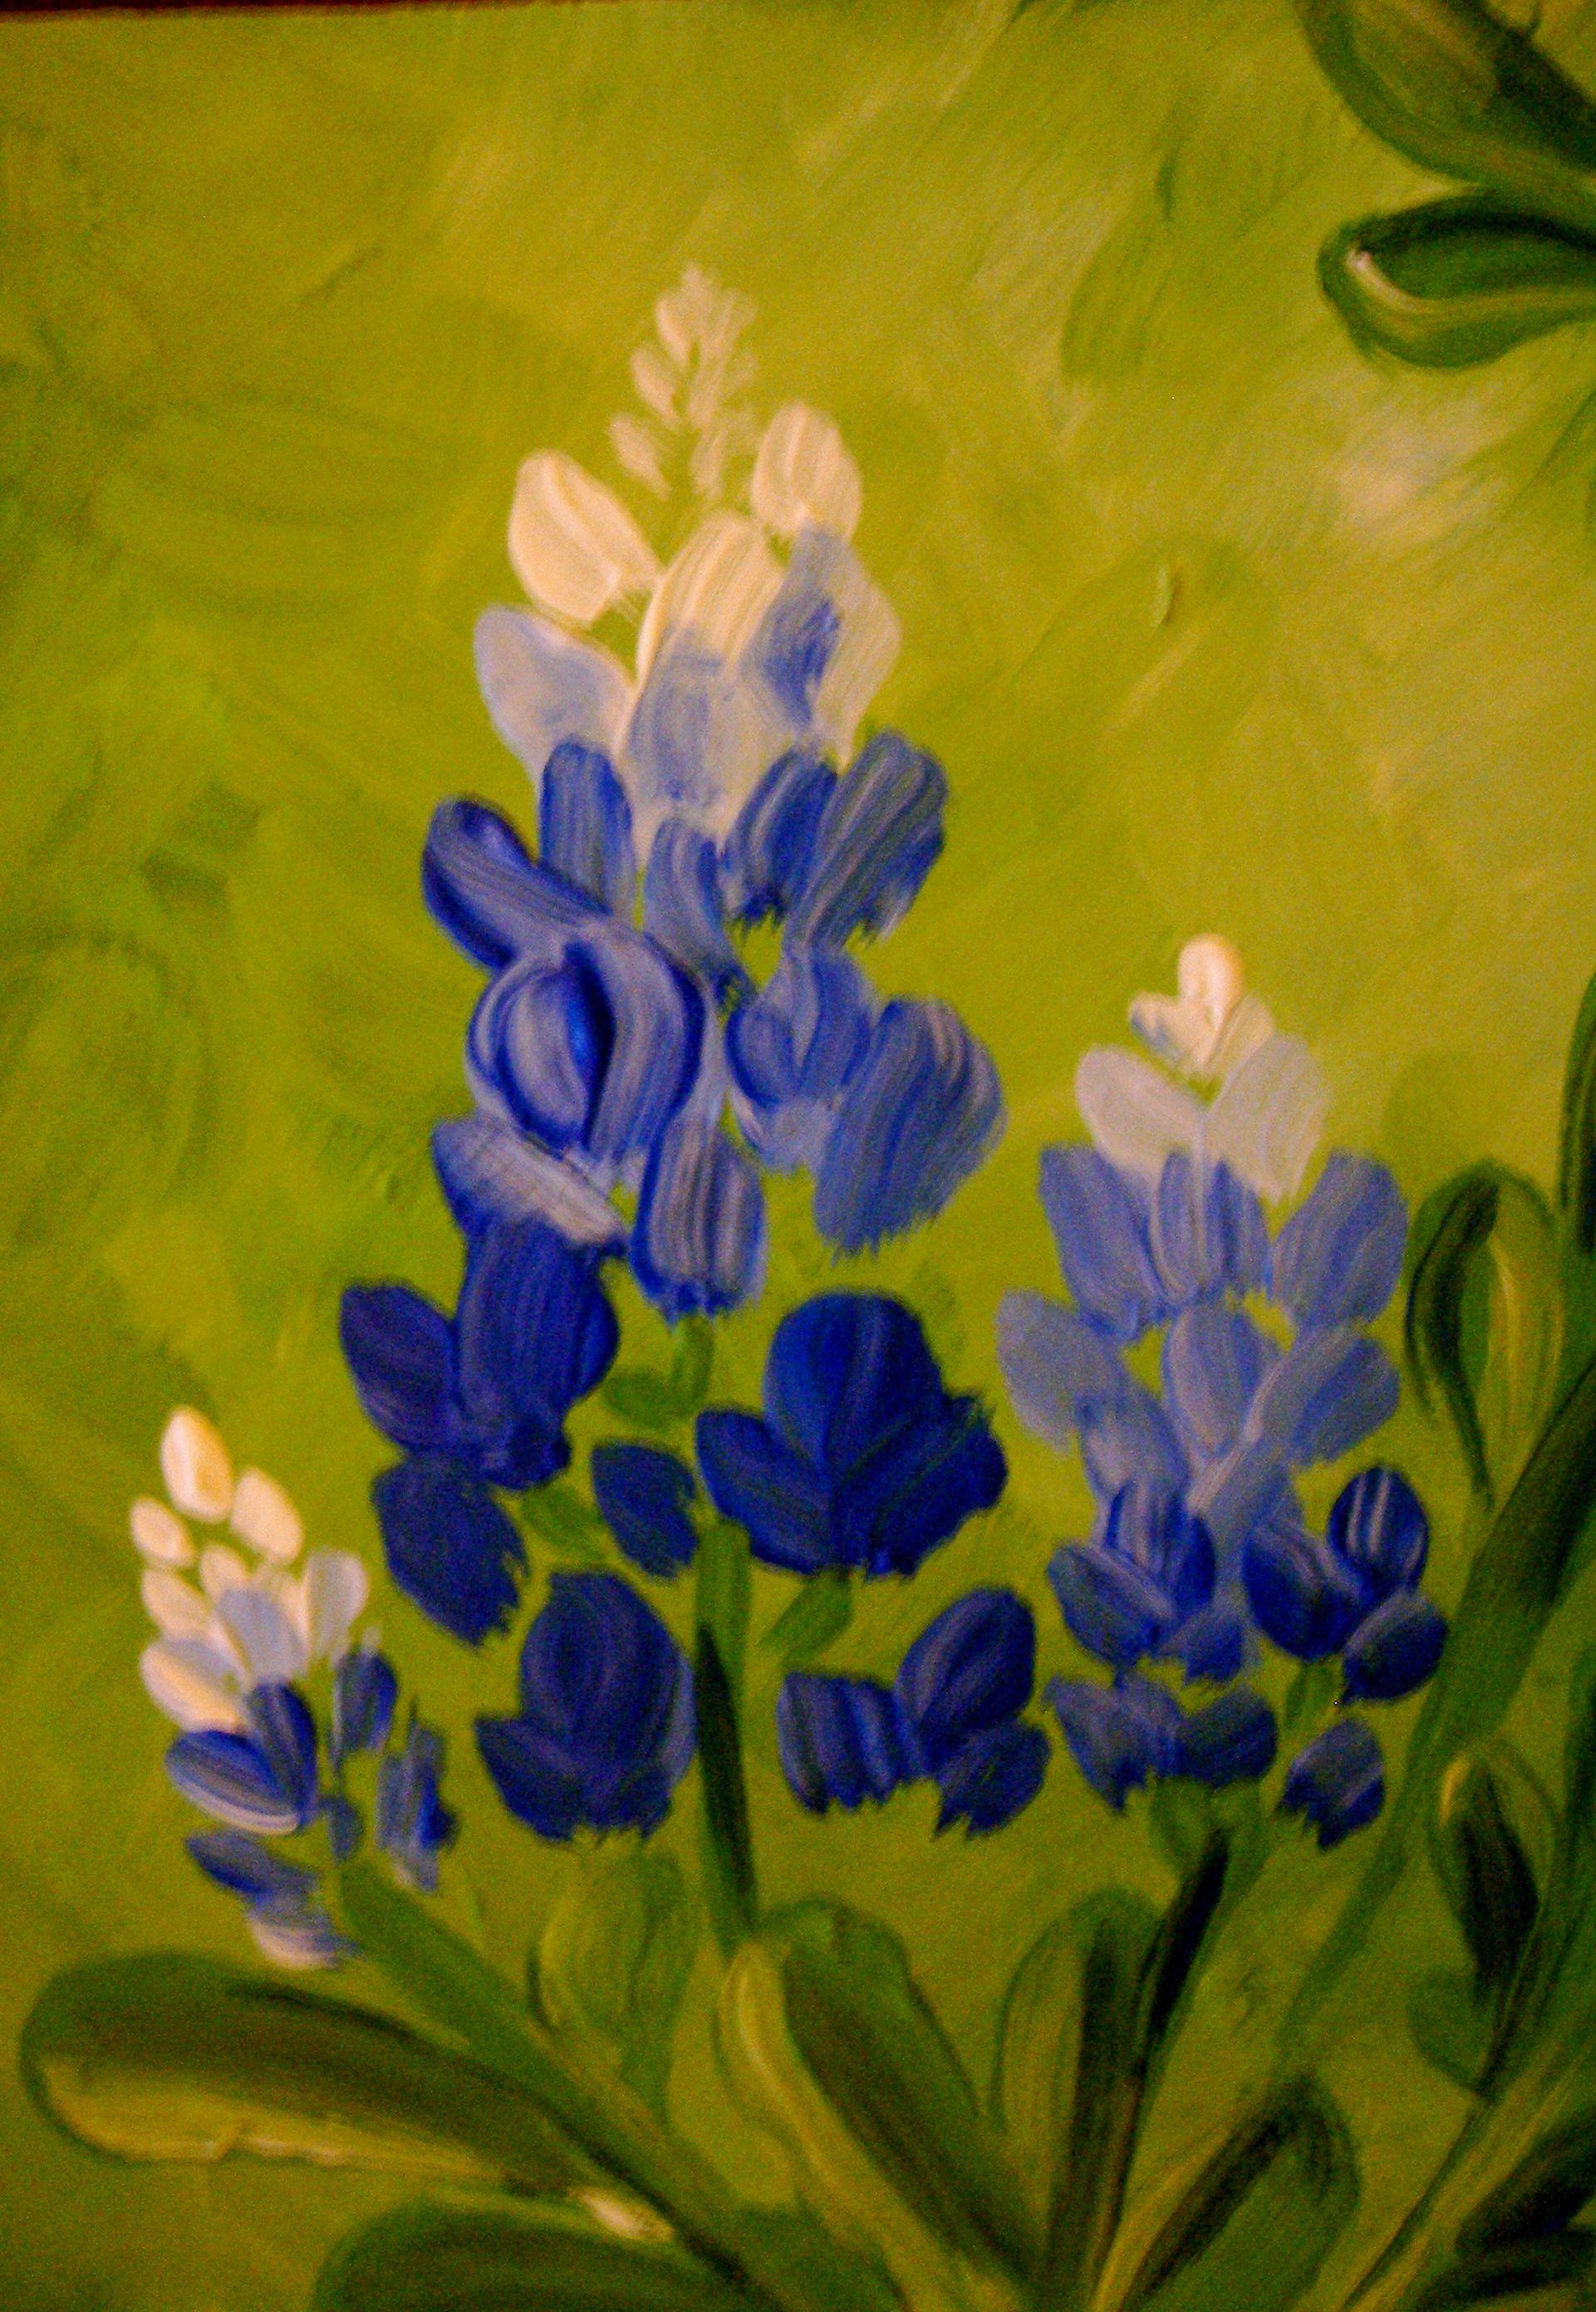 bluebonnets painting - Google Search | Paintings | Pinterest ...